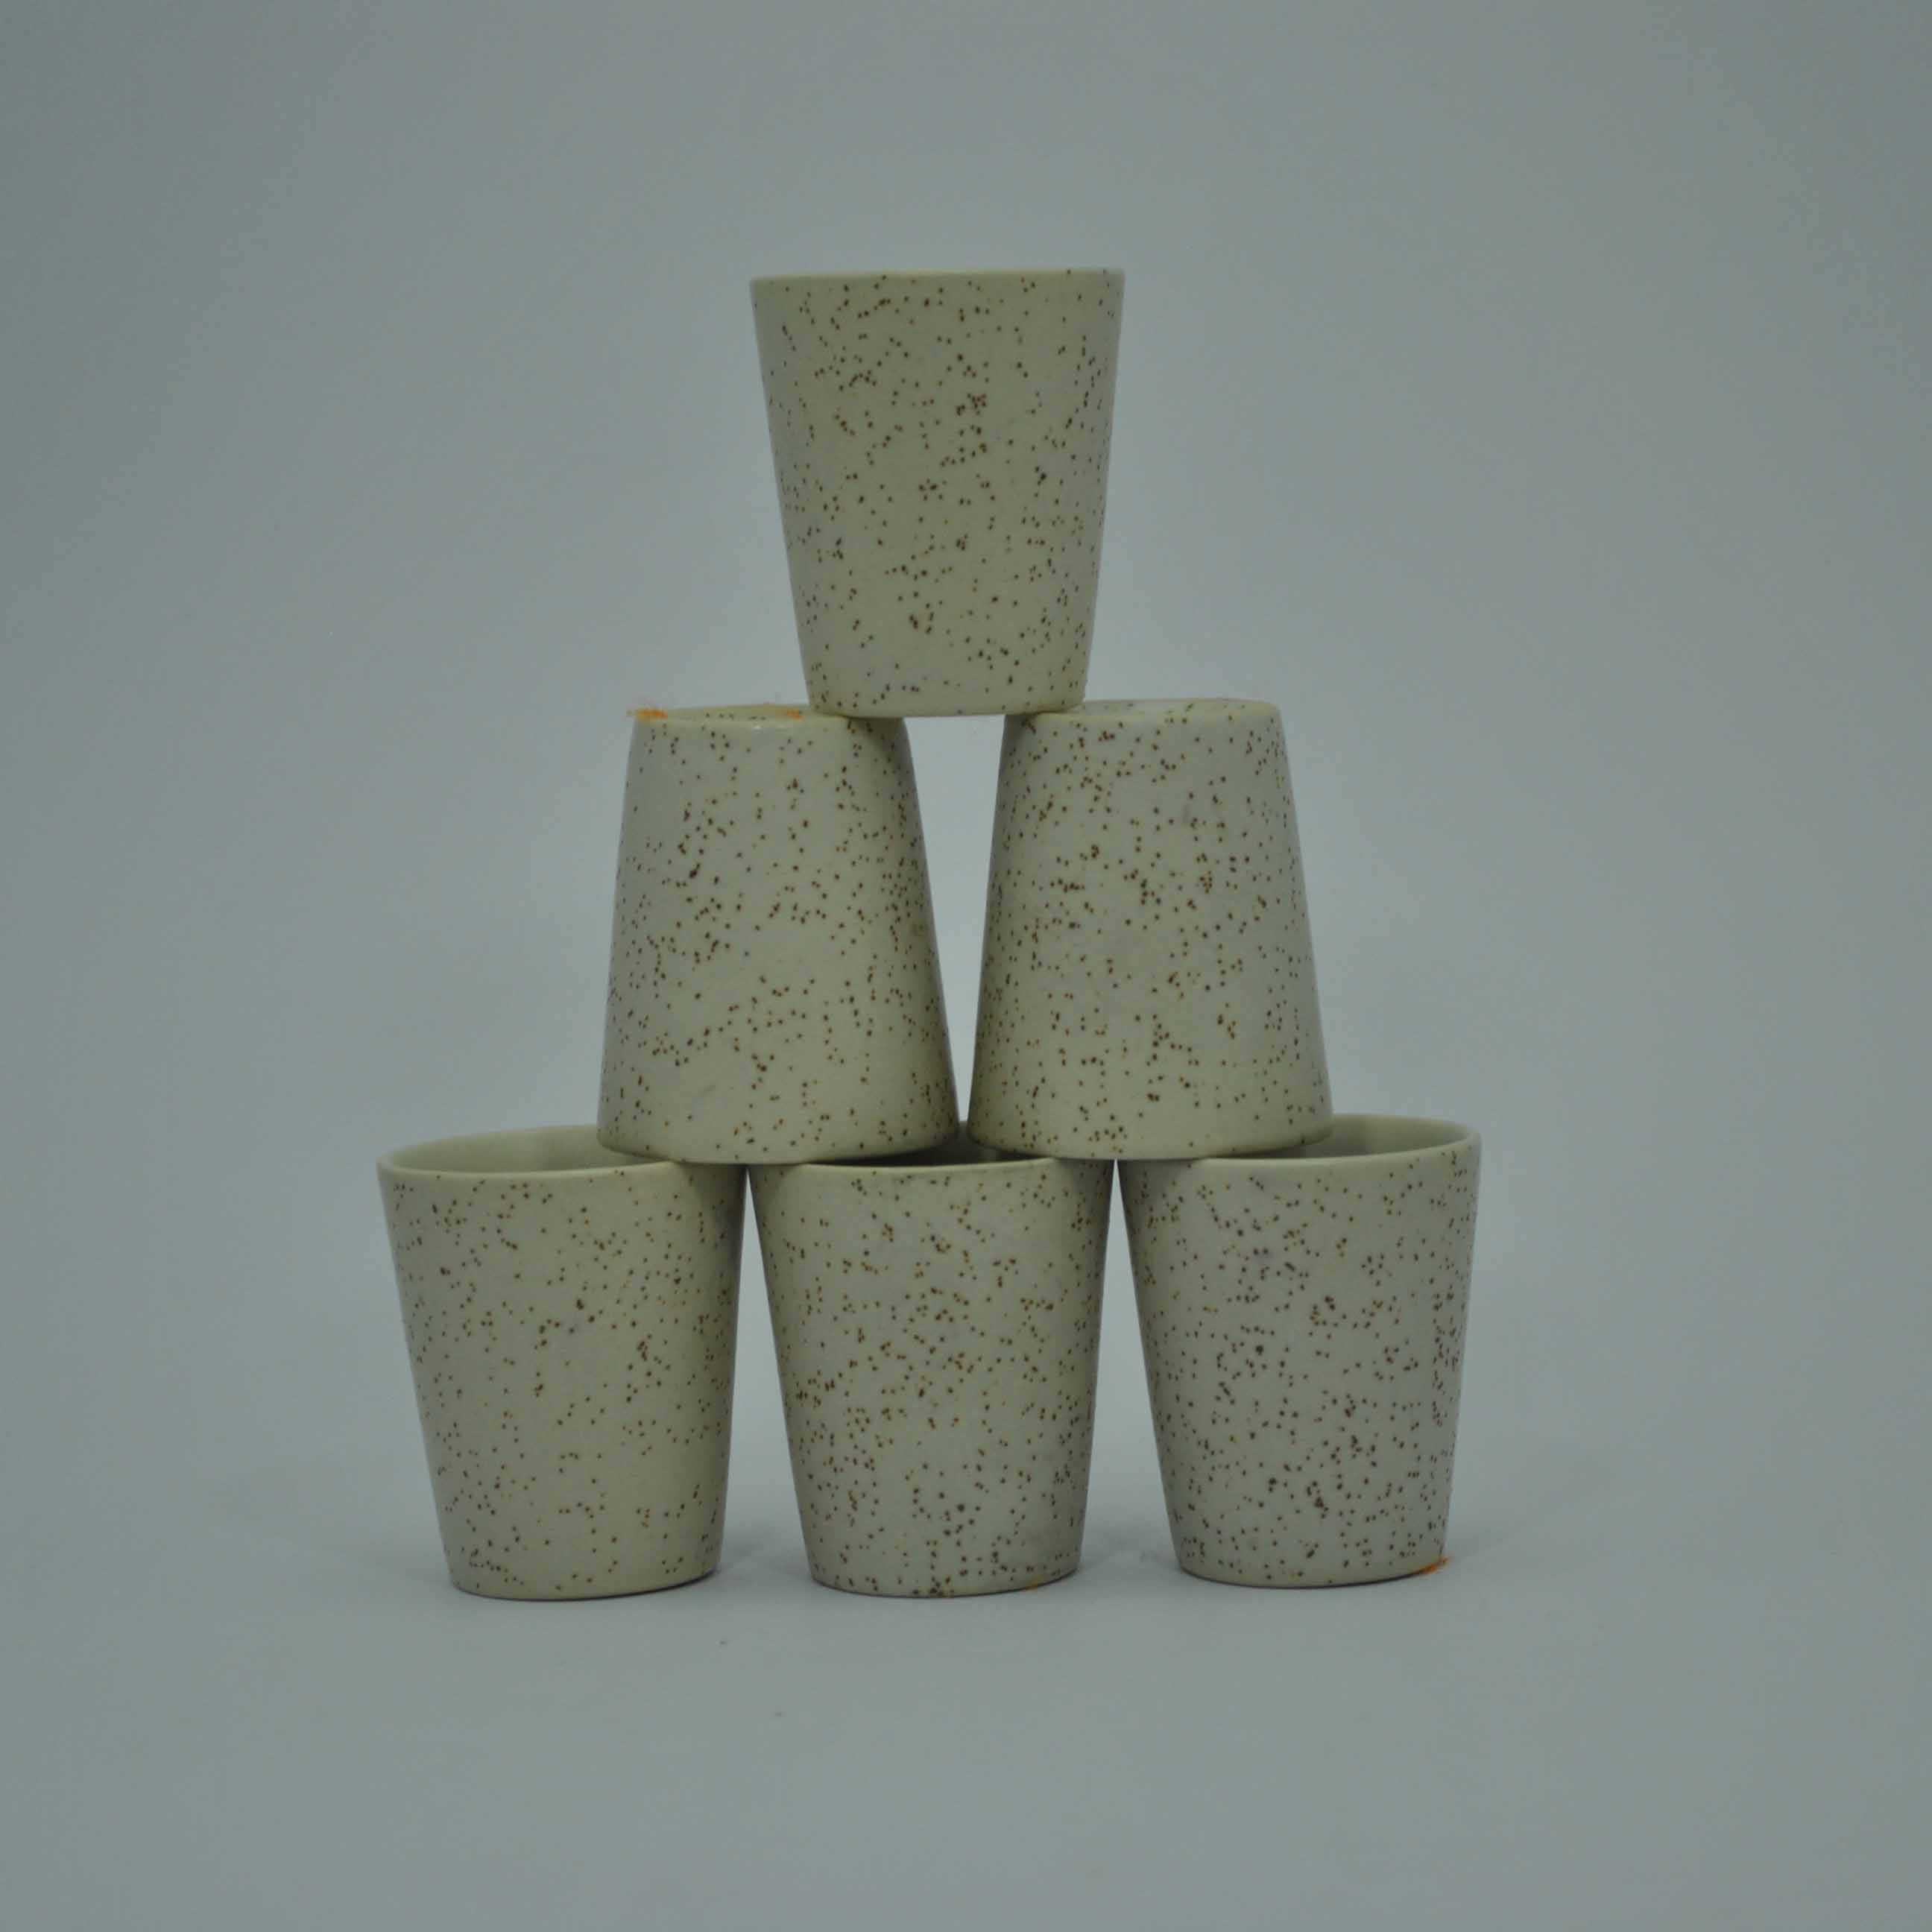 Ceramic Shot Glasses Marble Finish (set of 6)